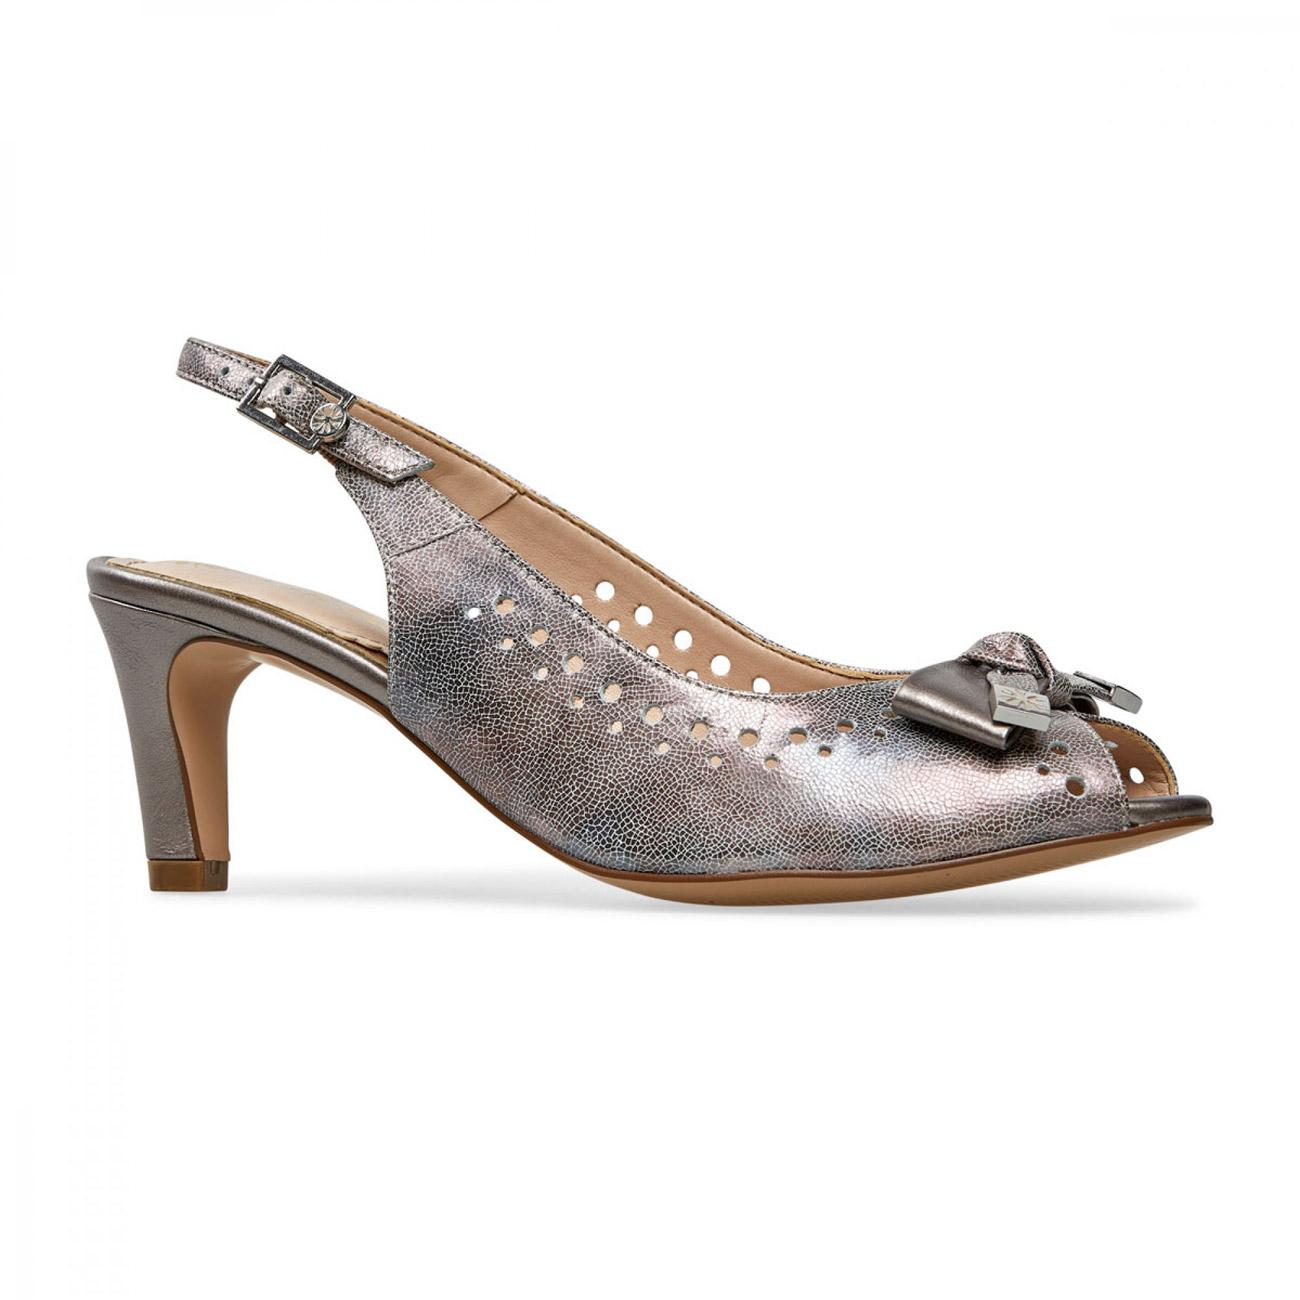 7313a76cc21da Van Dal Women's Hawkhurst Lunar Slingback Court   Women's Shoes ...